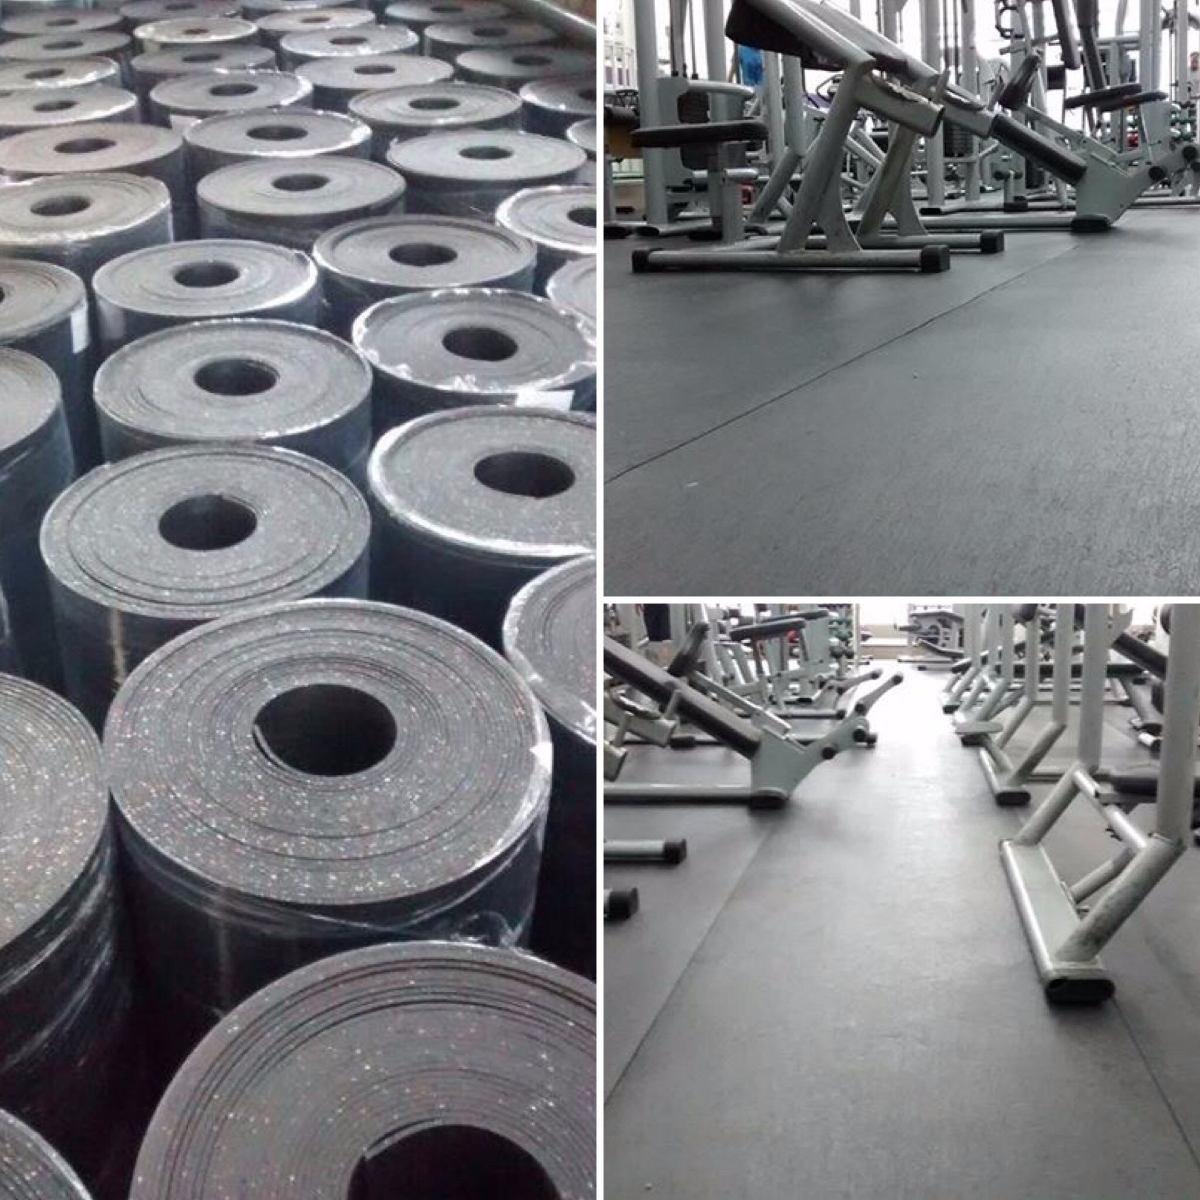 Funcional Studio Pilates Academia Piso Borracha Tapete R 56 00 Em  -> Tapete Para Sala De Pilates